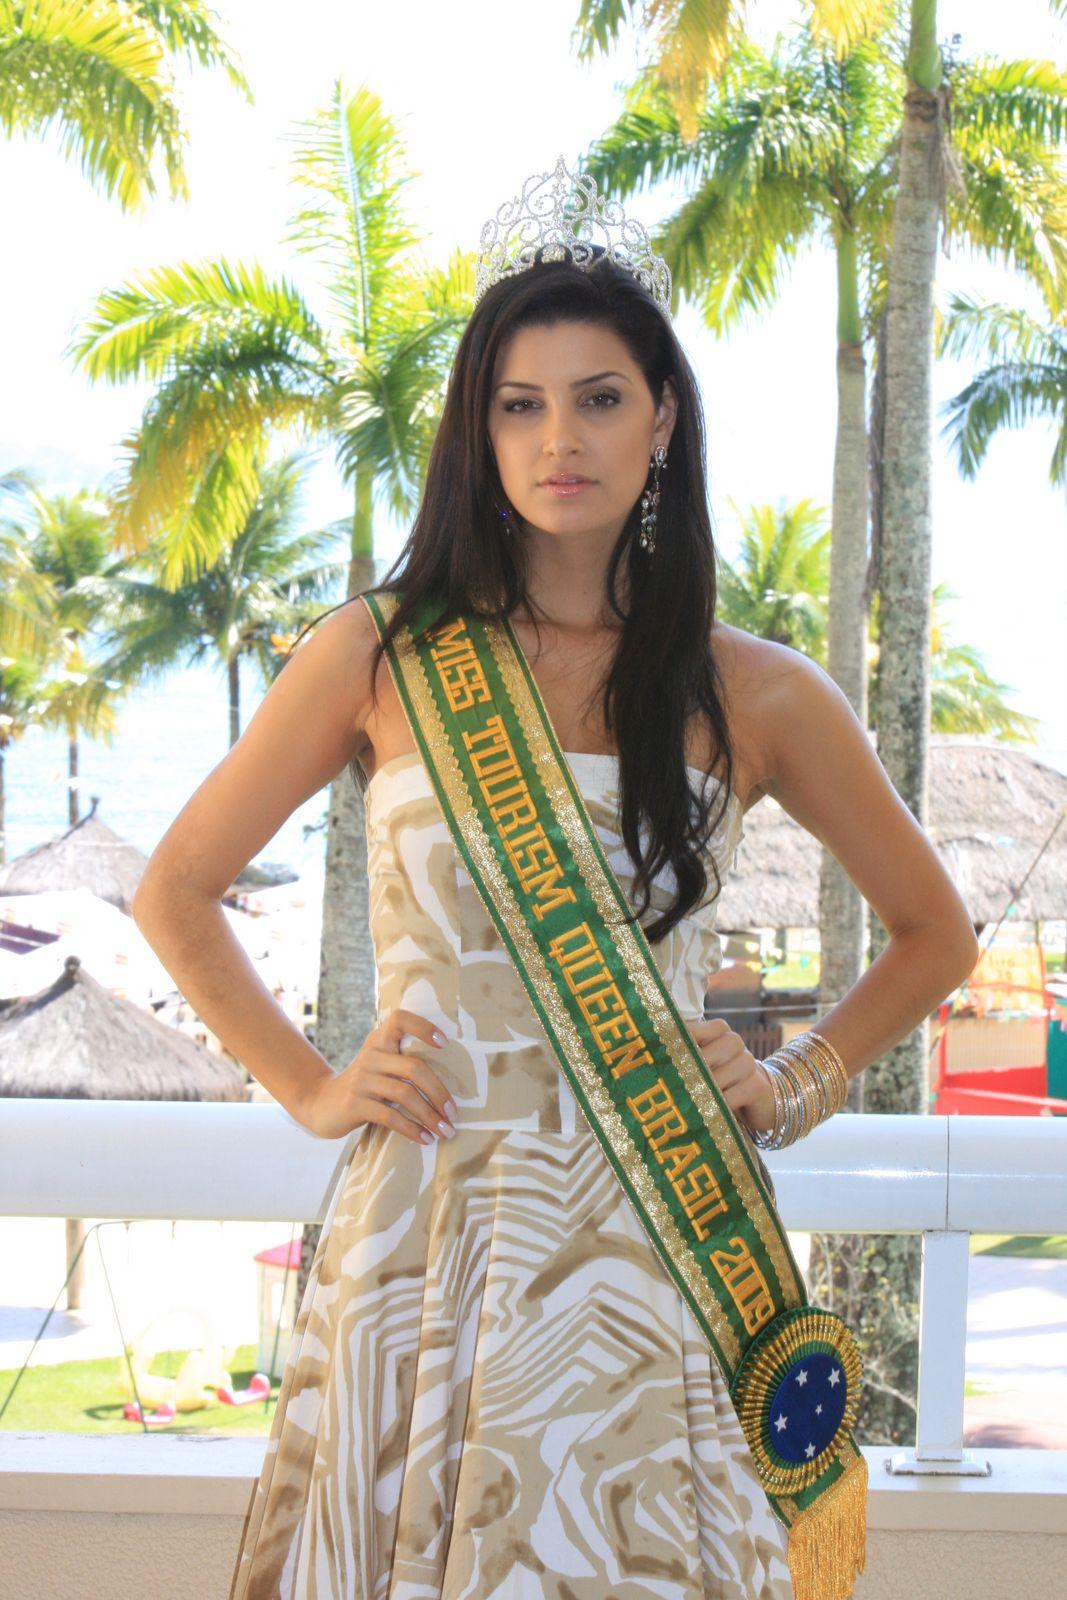 vivian noronha, rainha hispanoamericana 2008. suplente. - Página 4 973qkuhk